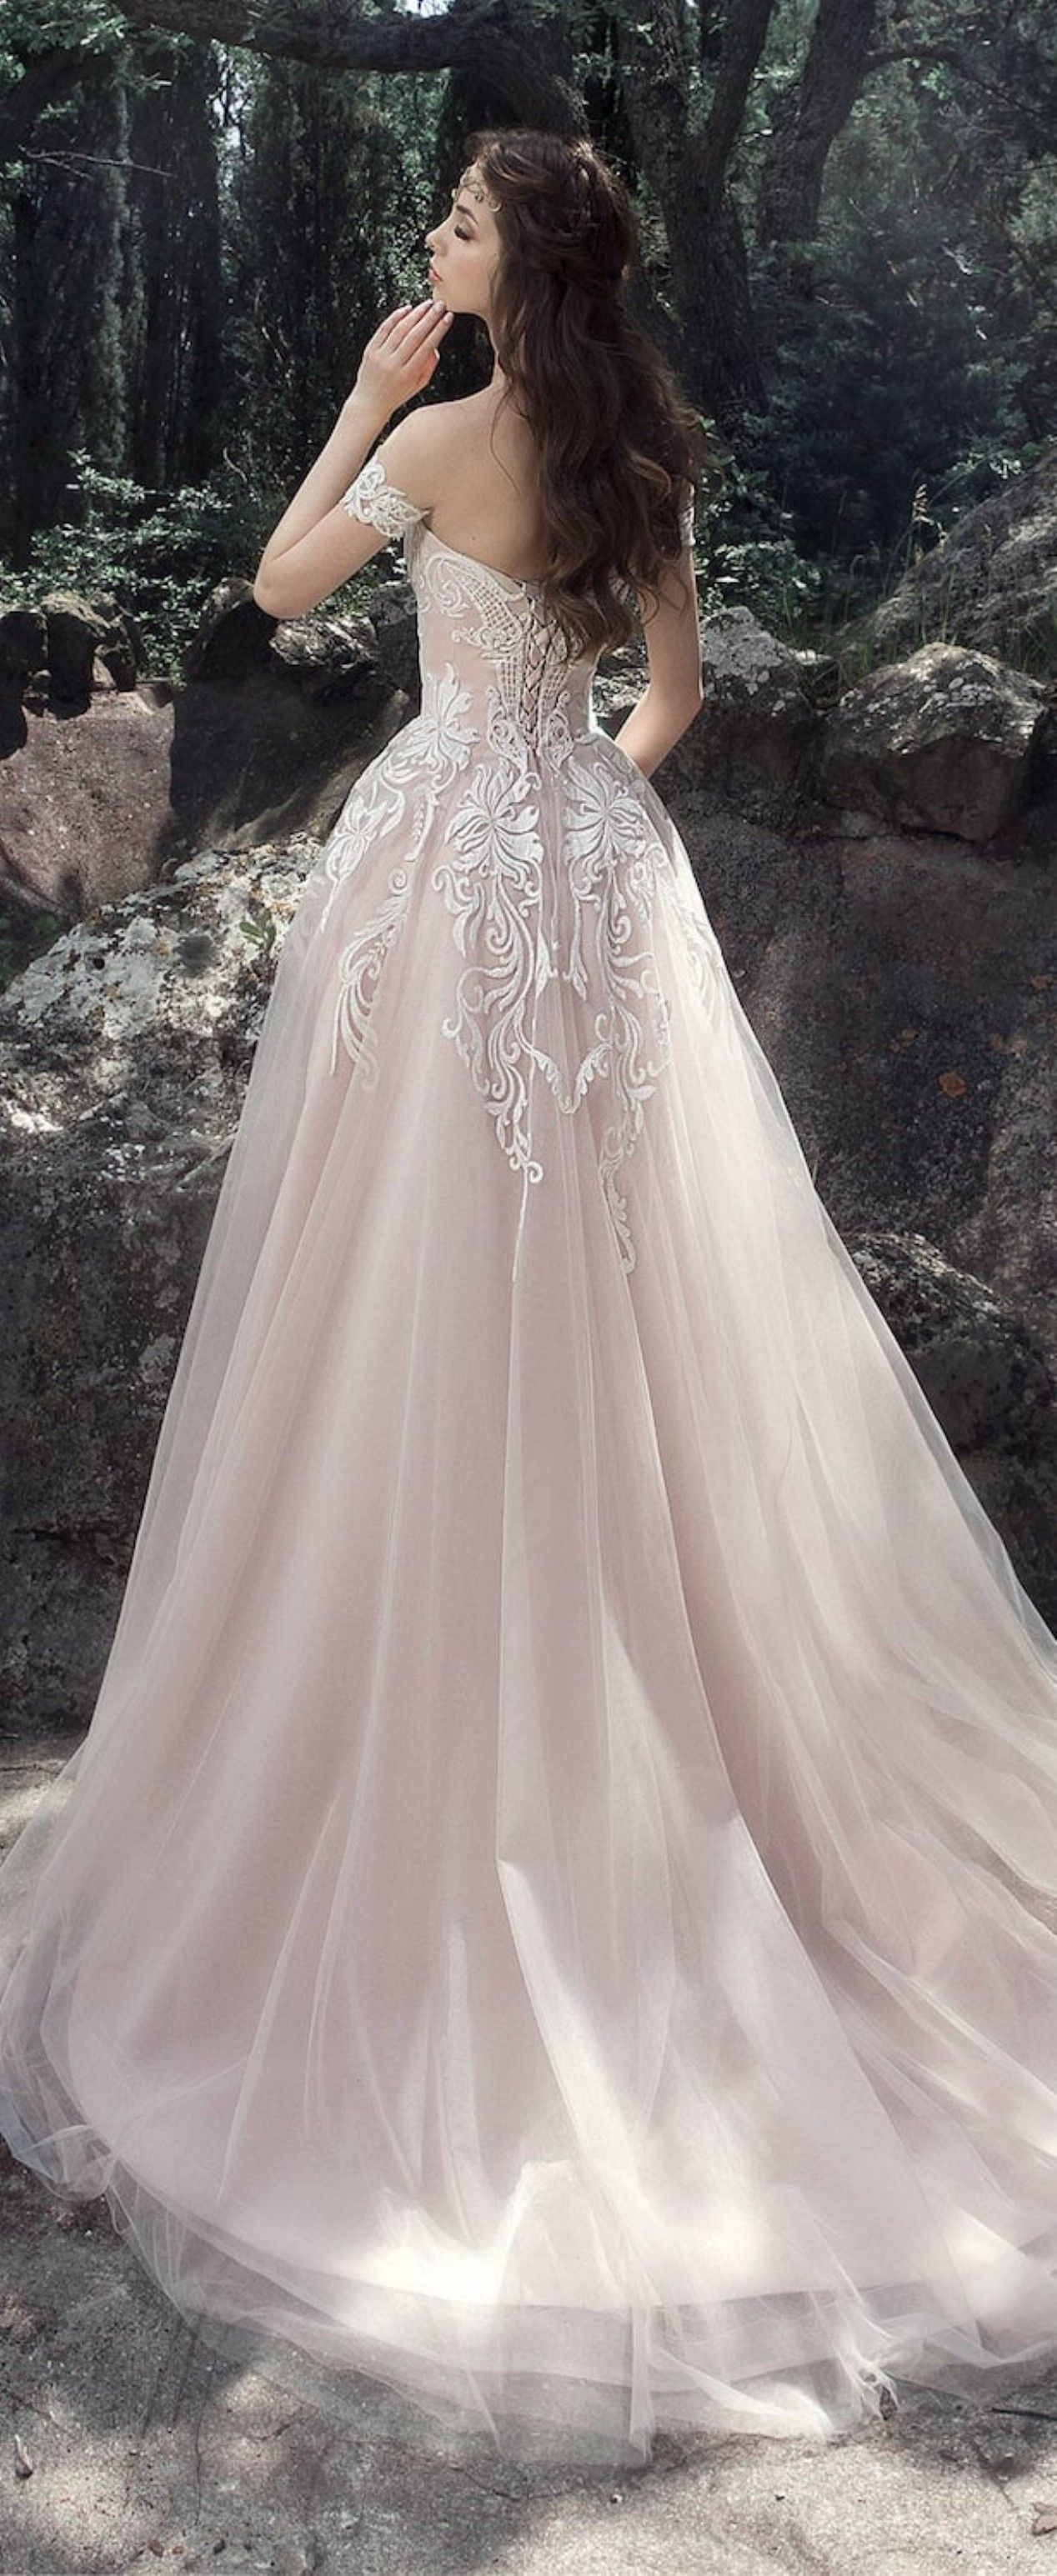 55 Breathtaking Disney Princess Wedding Dress to Fullfill your ...